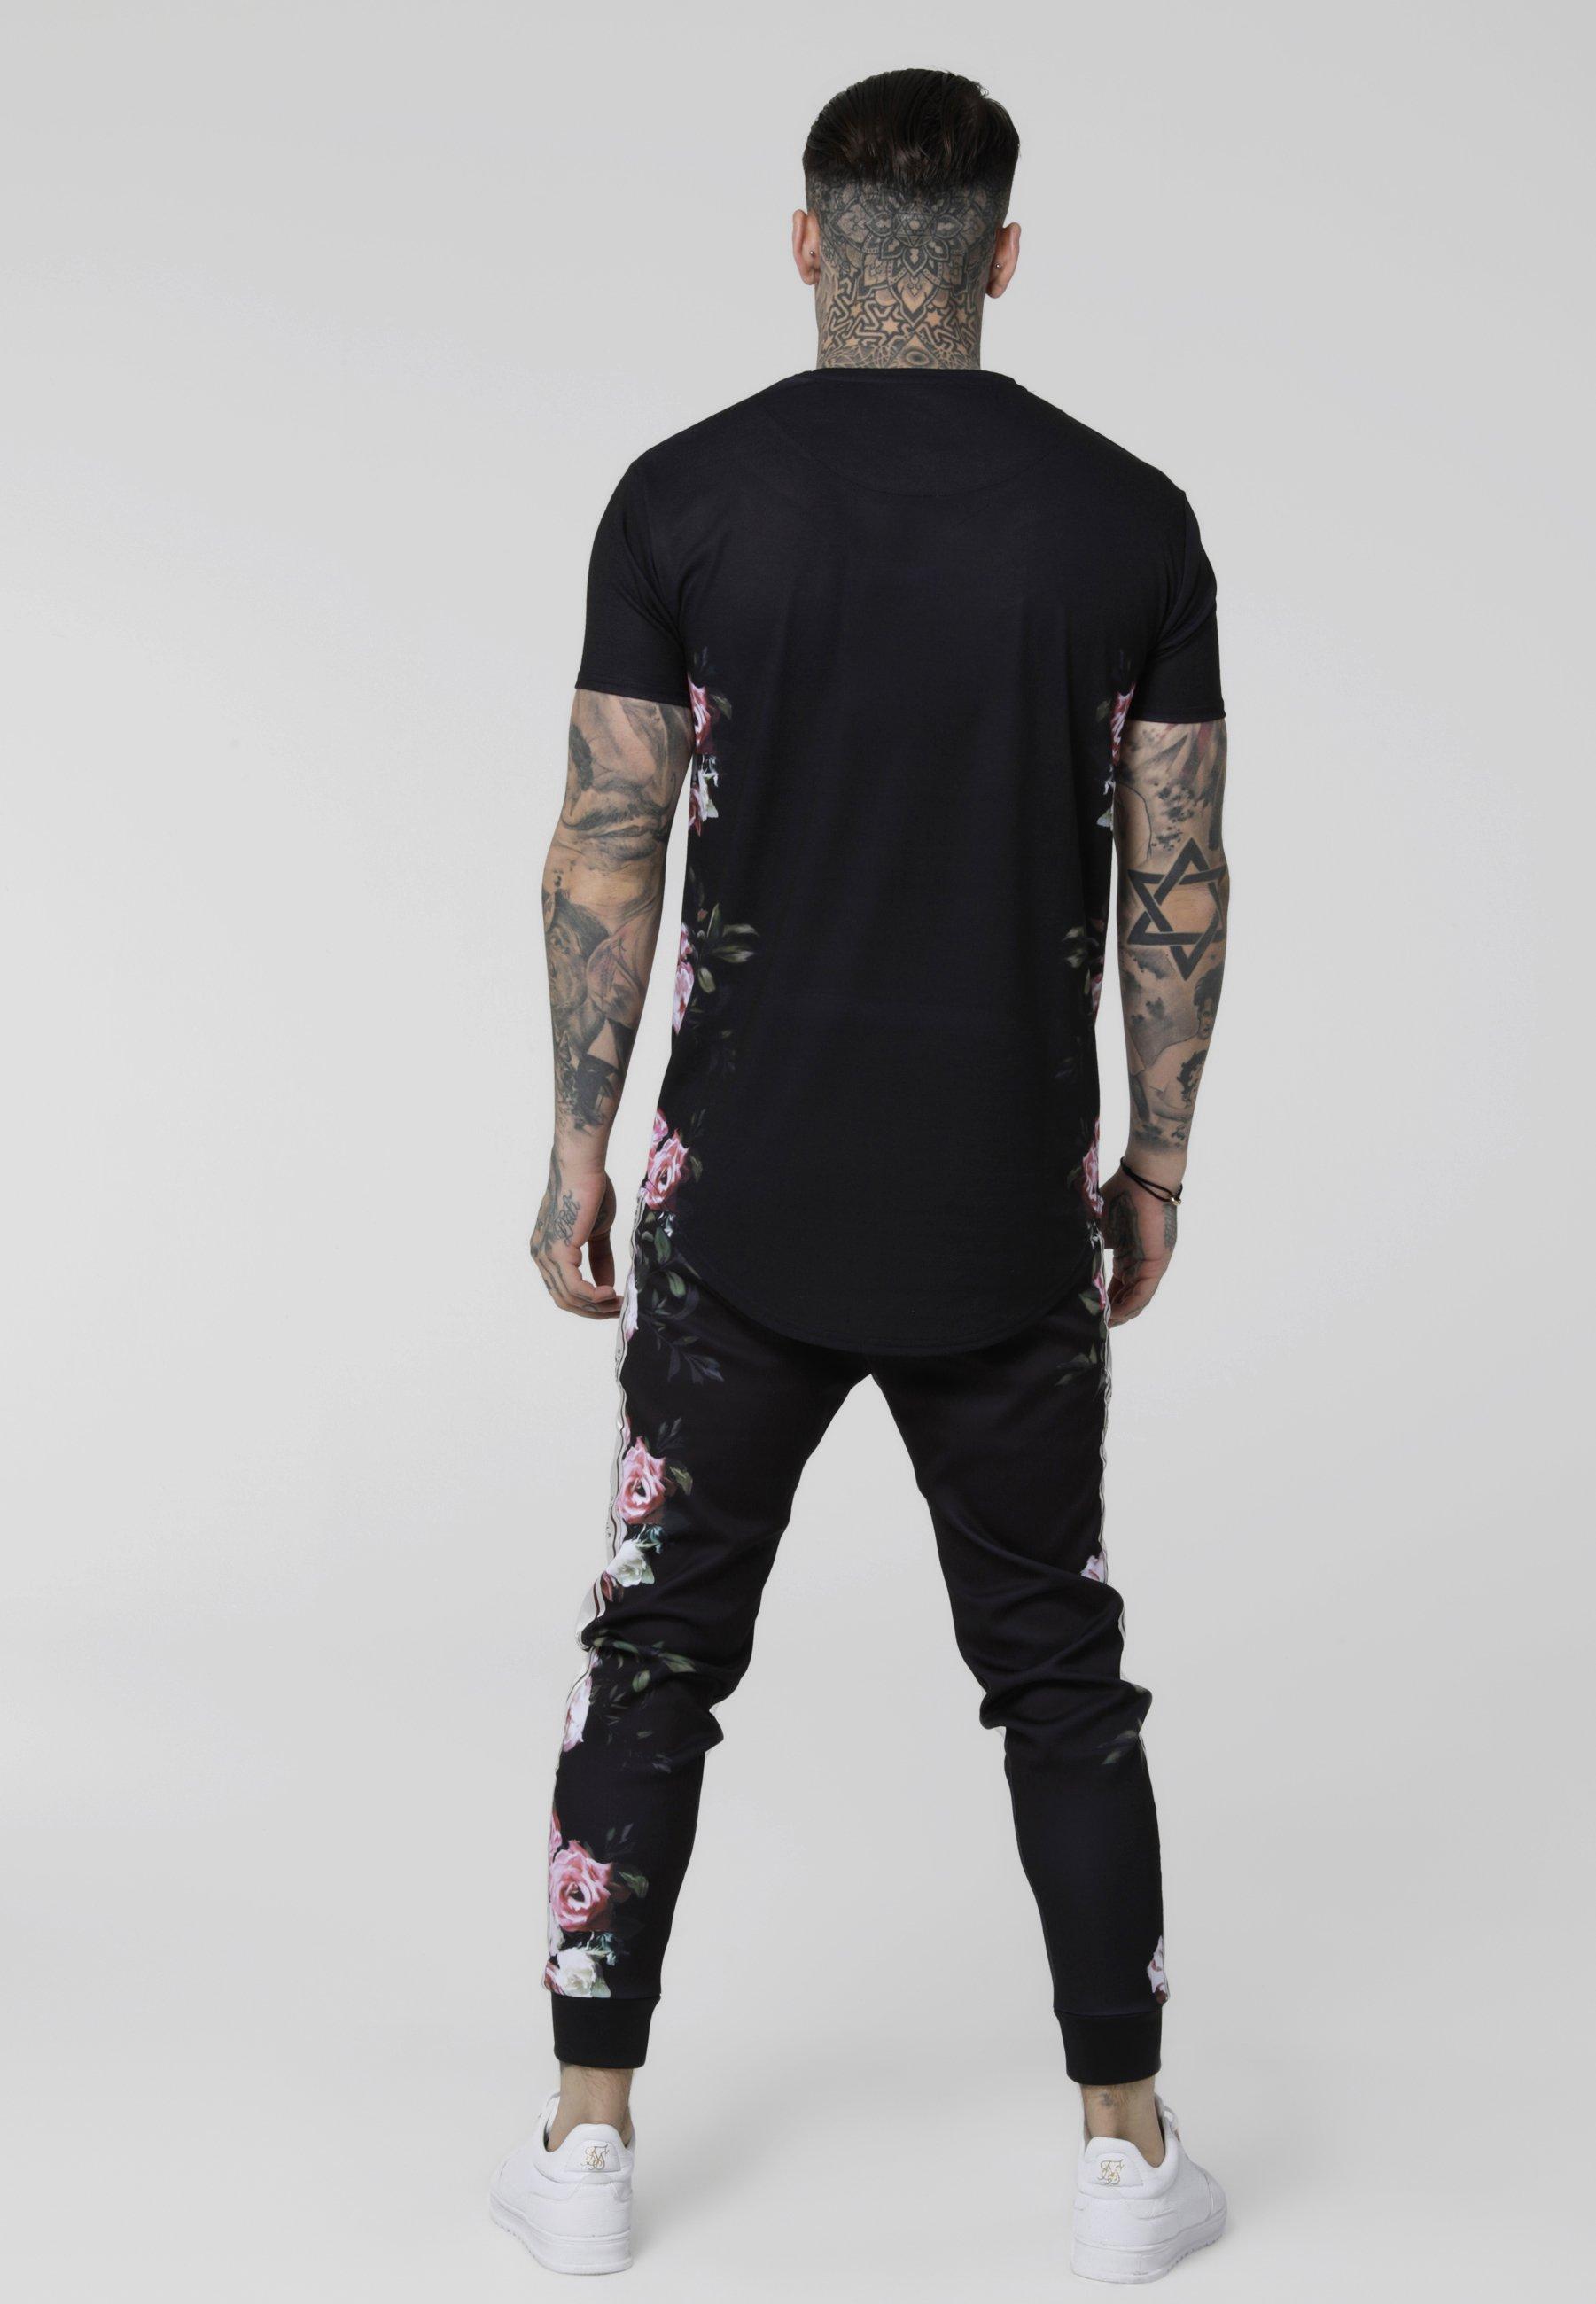 Oil Curved Siksilk Black Hem Imprimé Paint TeeT shirt FlJcK1T3